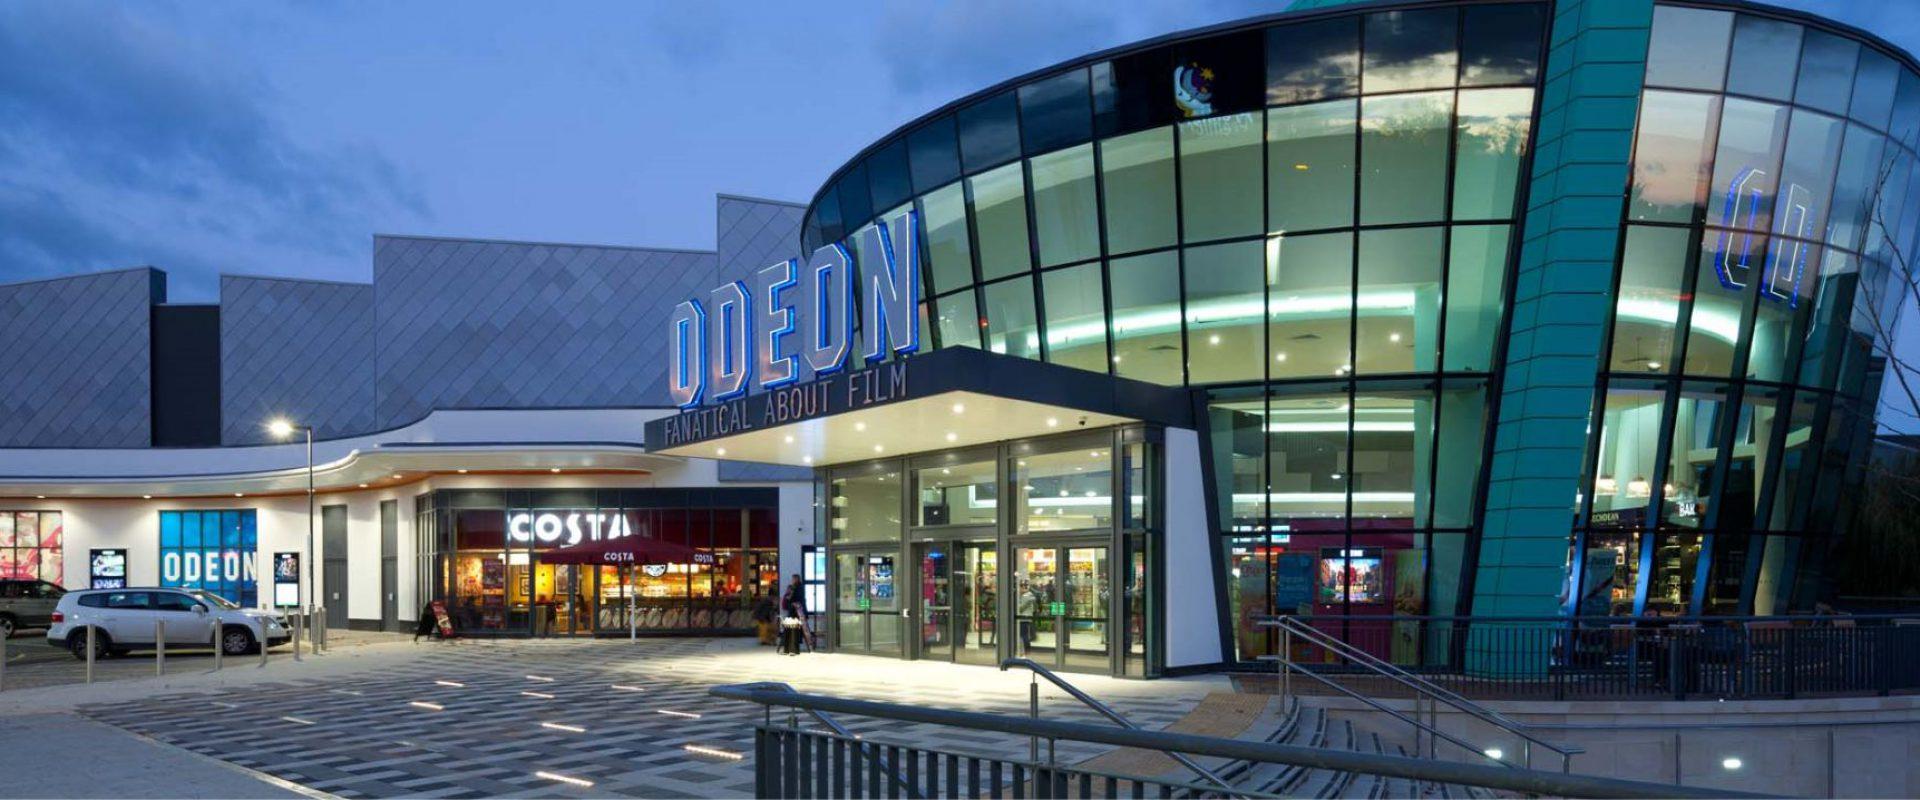 Odeon Trowbridge Glazing and Curtain Walling